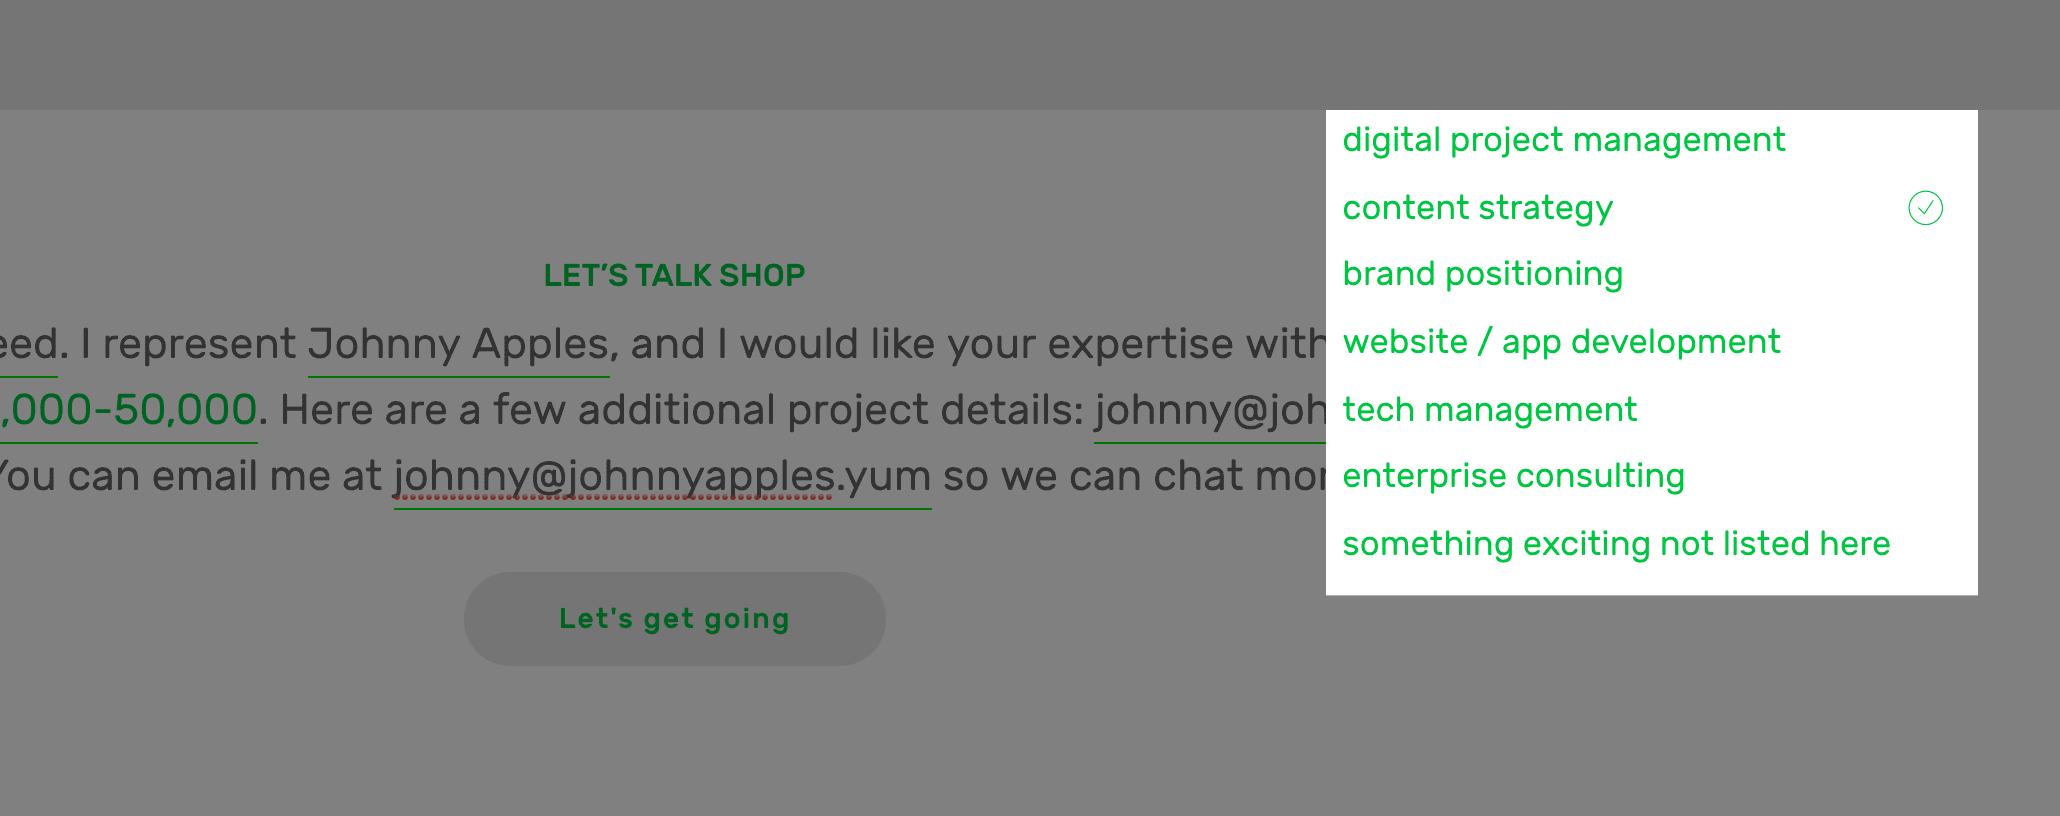 andy-stiebler-llc-columbus-digital-consultant-website-natural-language-form2.jpg